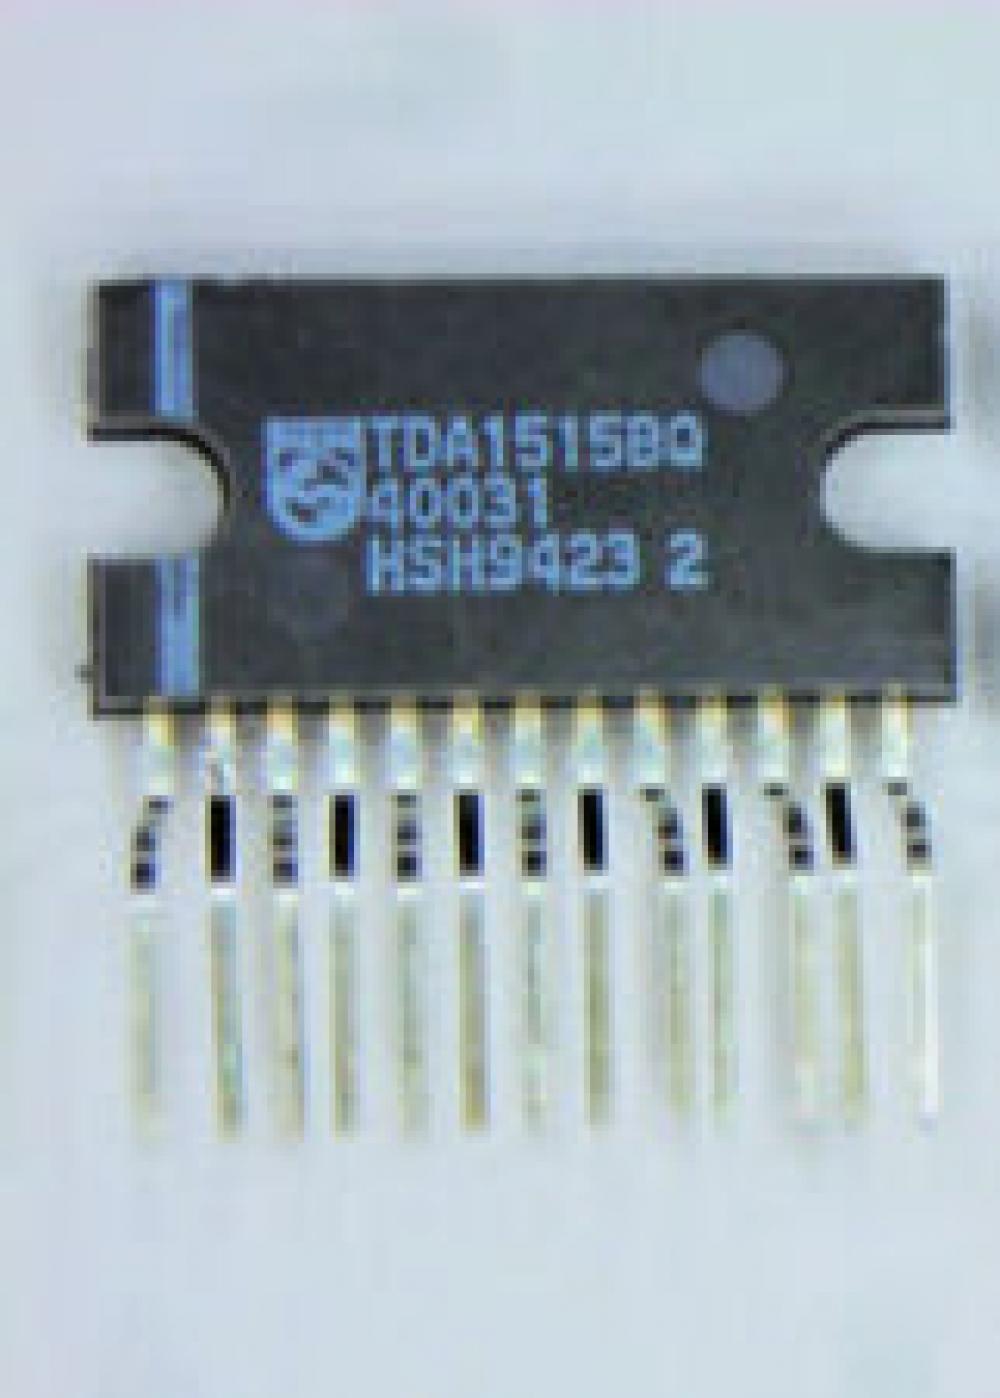 Tda1515bq Ic Integrated Circuits Ics 4000 Series Coastal Circuit